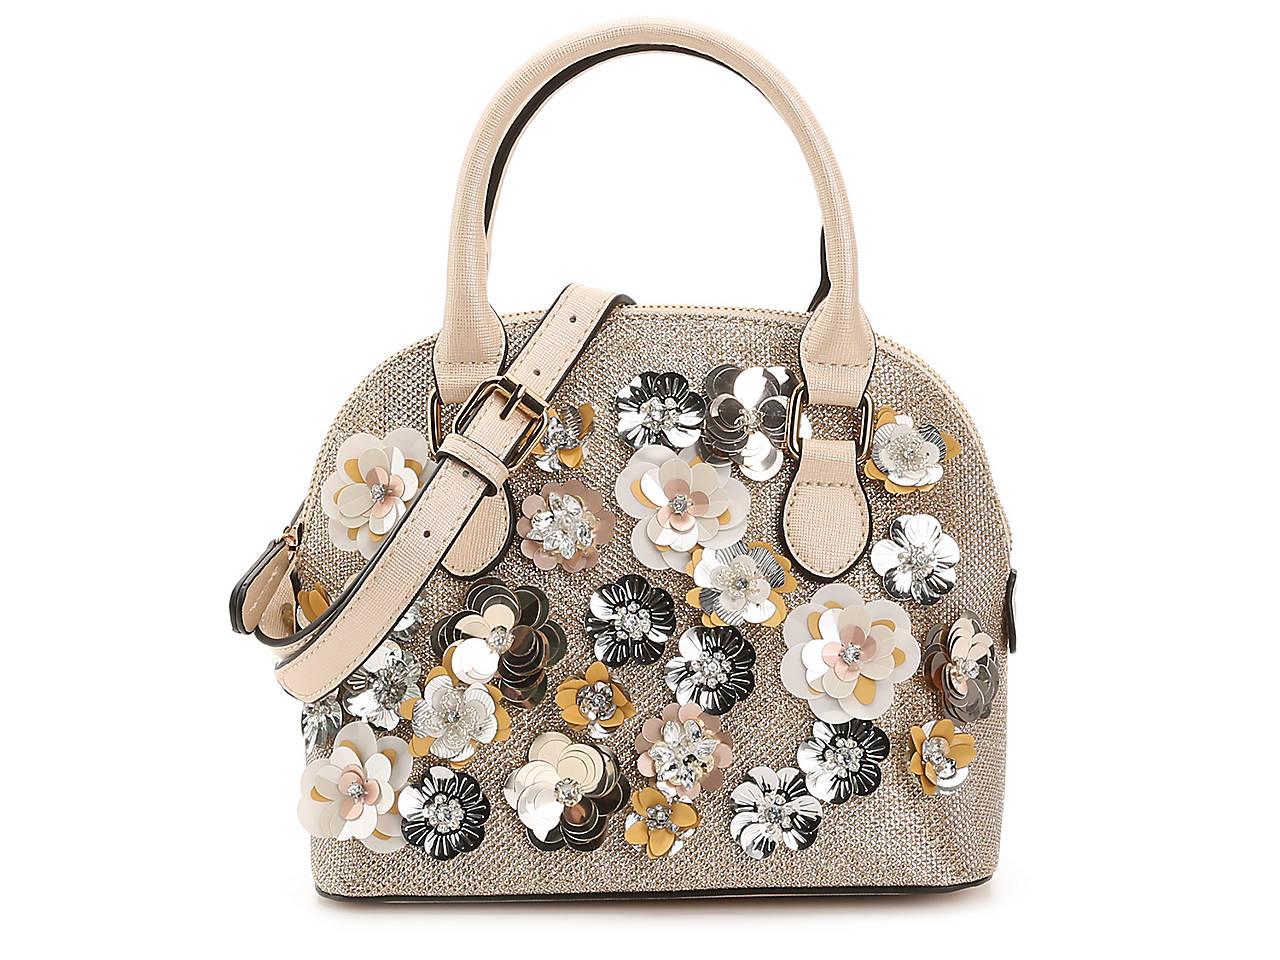 55a23c5d64 Aldo Dwydia Satchel Women's Handbags & Accessories | DSW